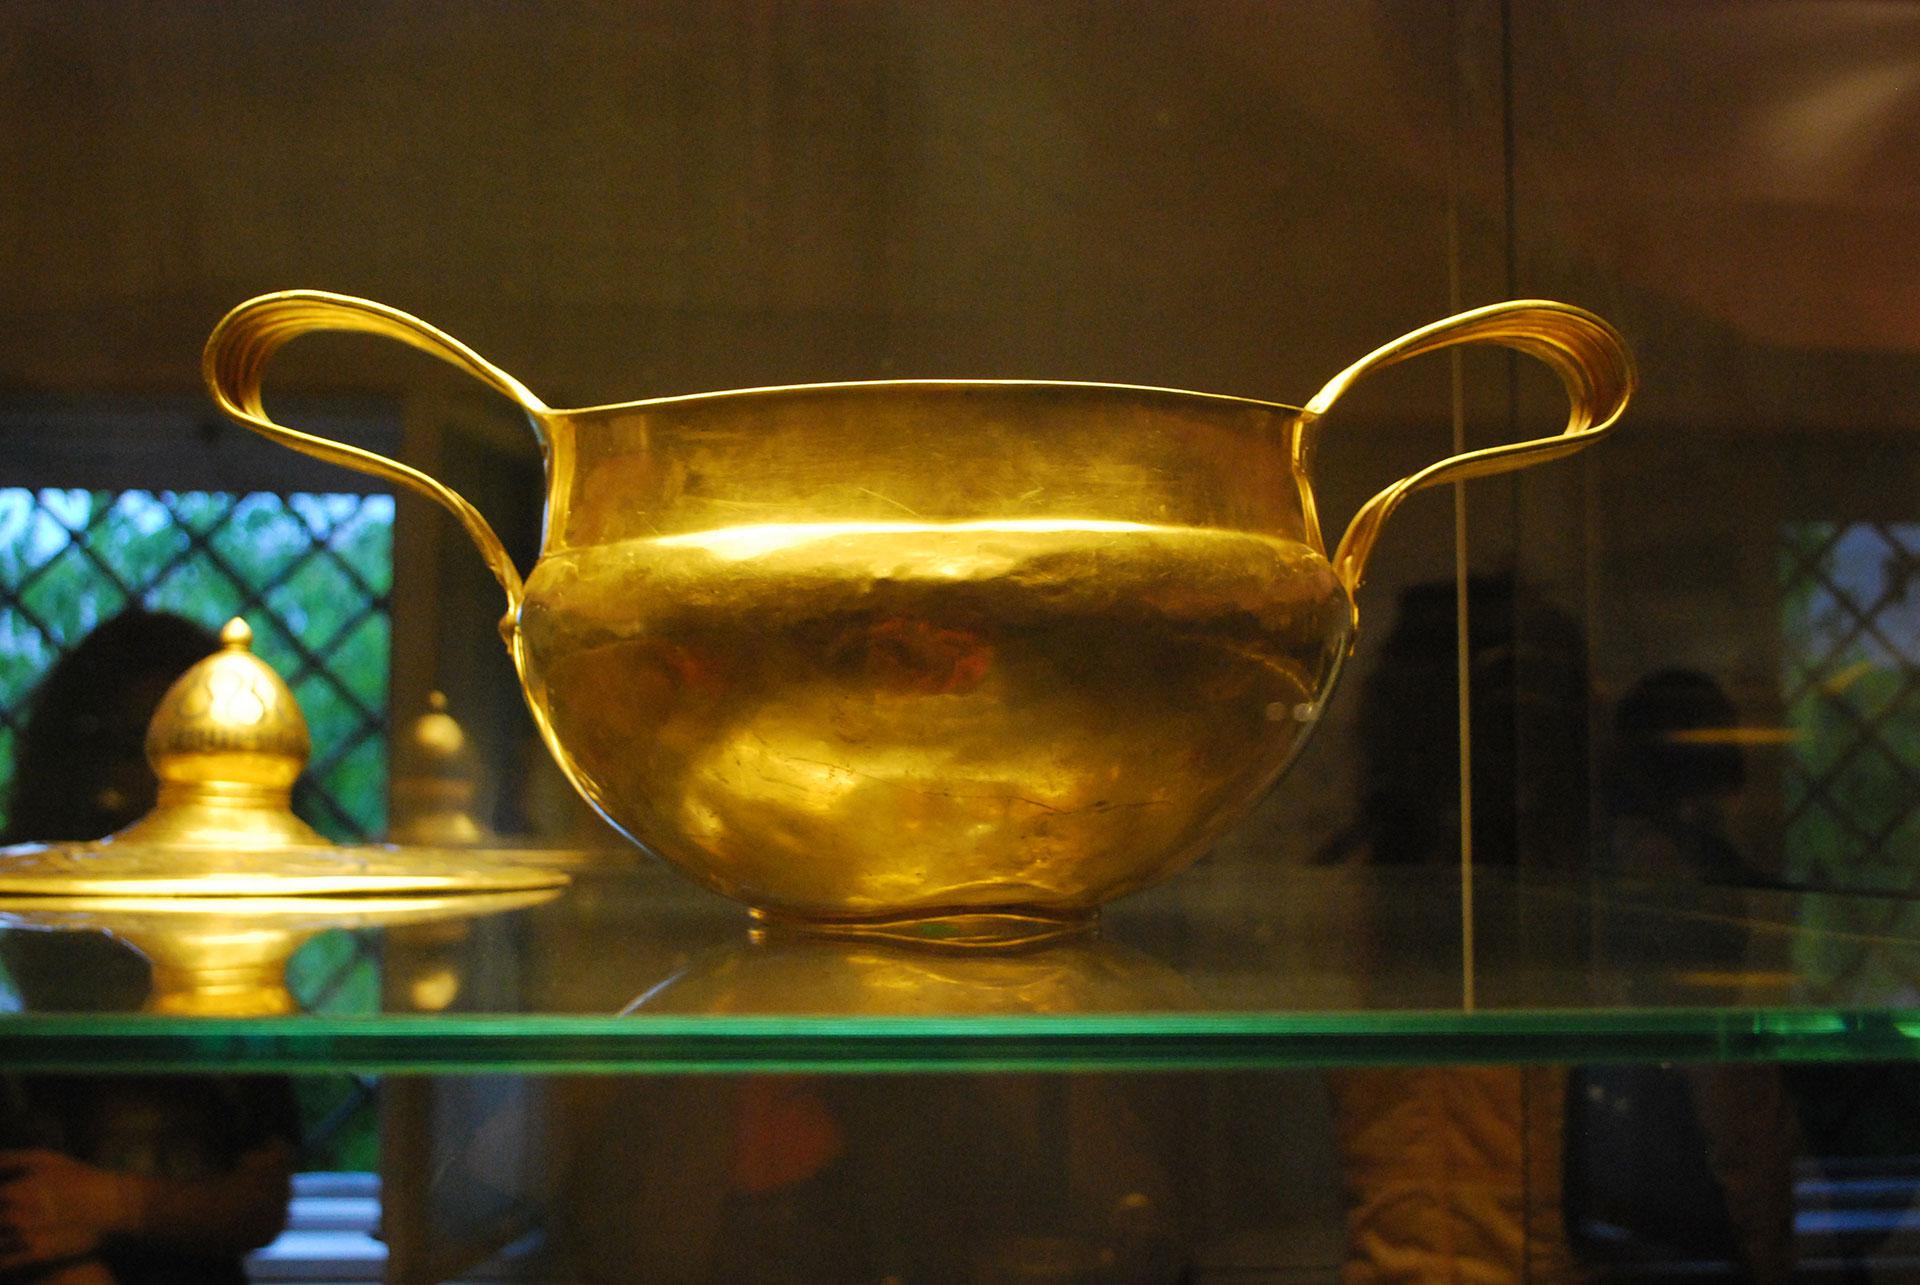 Valchitran's-Gold-XIV_XIIIc-BC